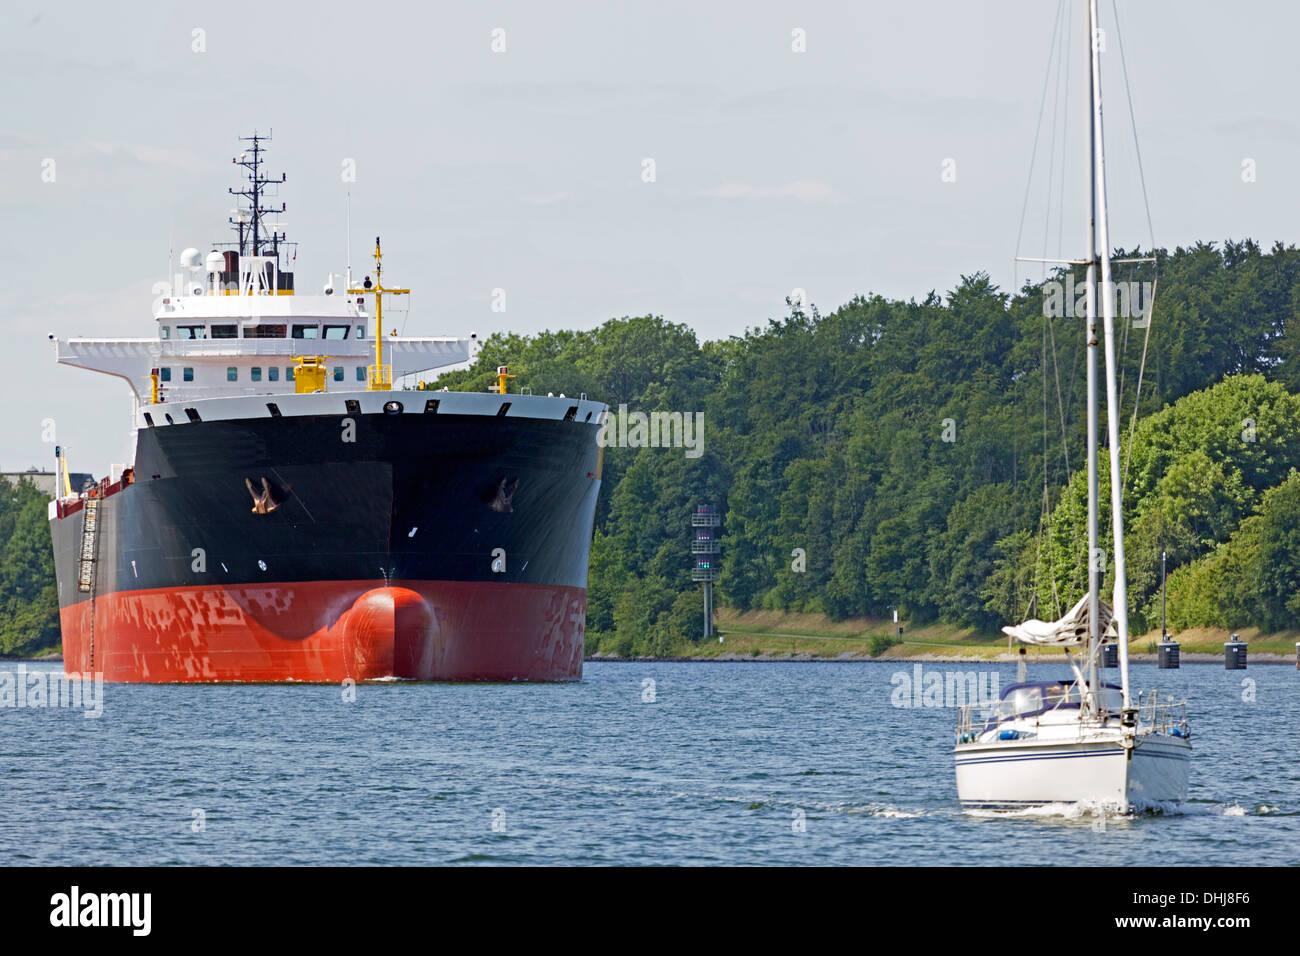 Tanker ship and sailboat on Kiel Canal, Germany - Stock Image